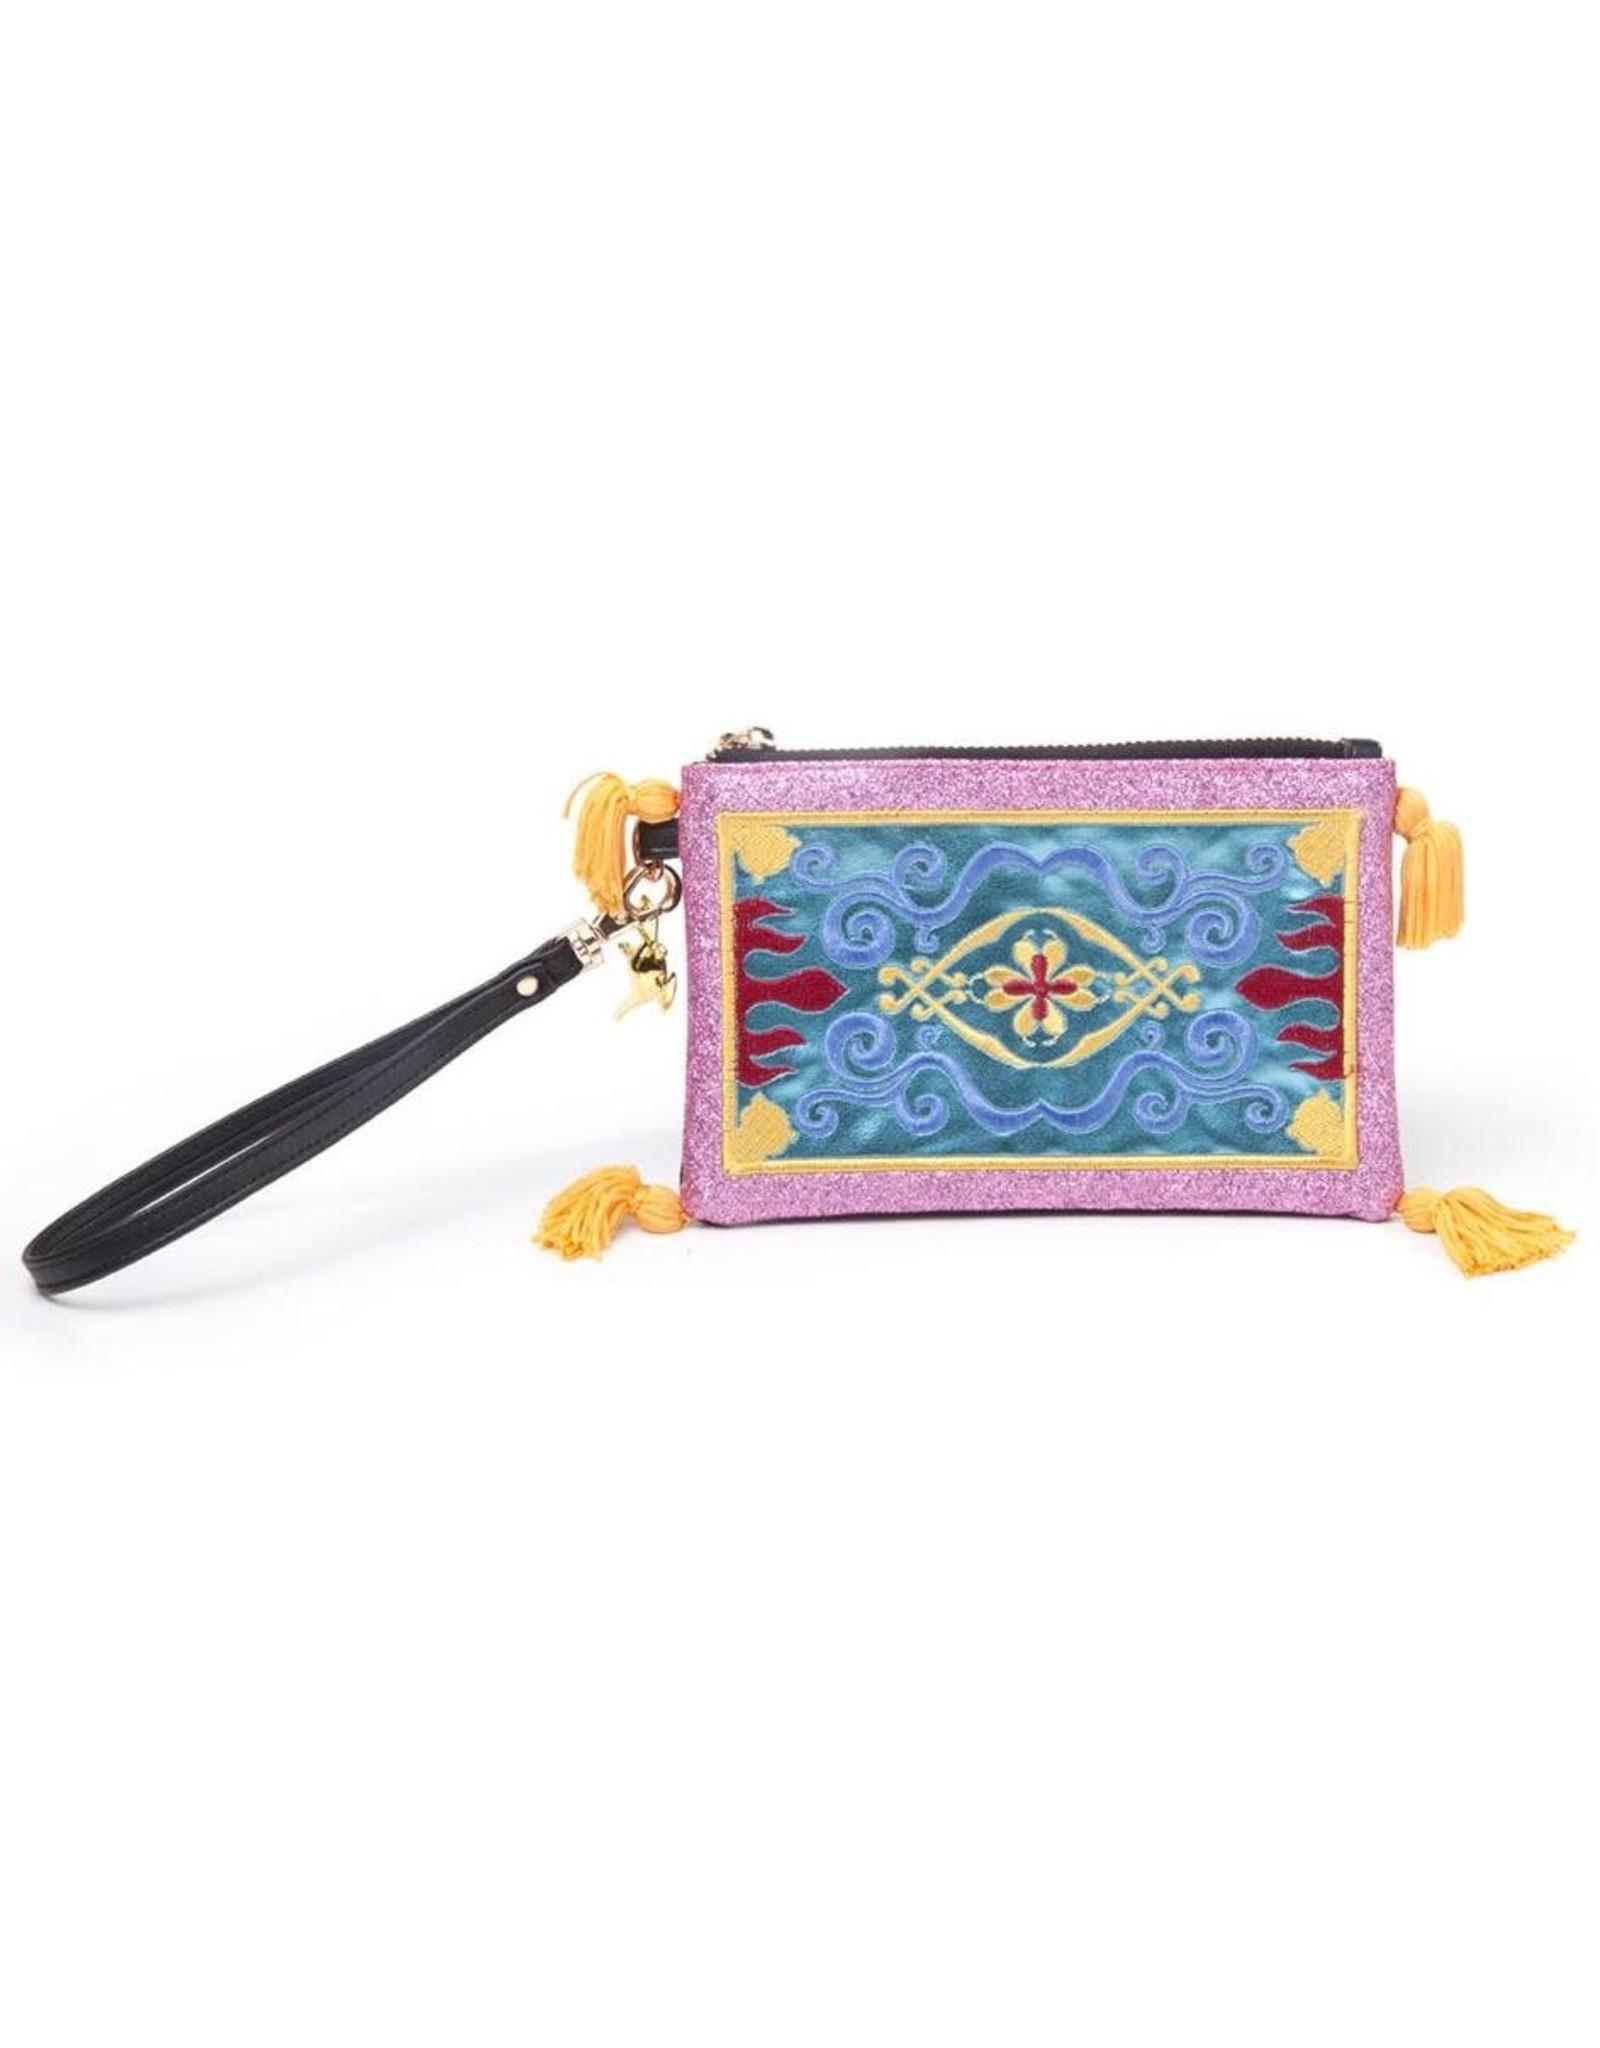 DISNEY - Aladdin Magic Carped Pouch Wallet